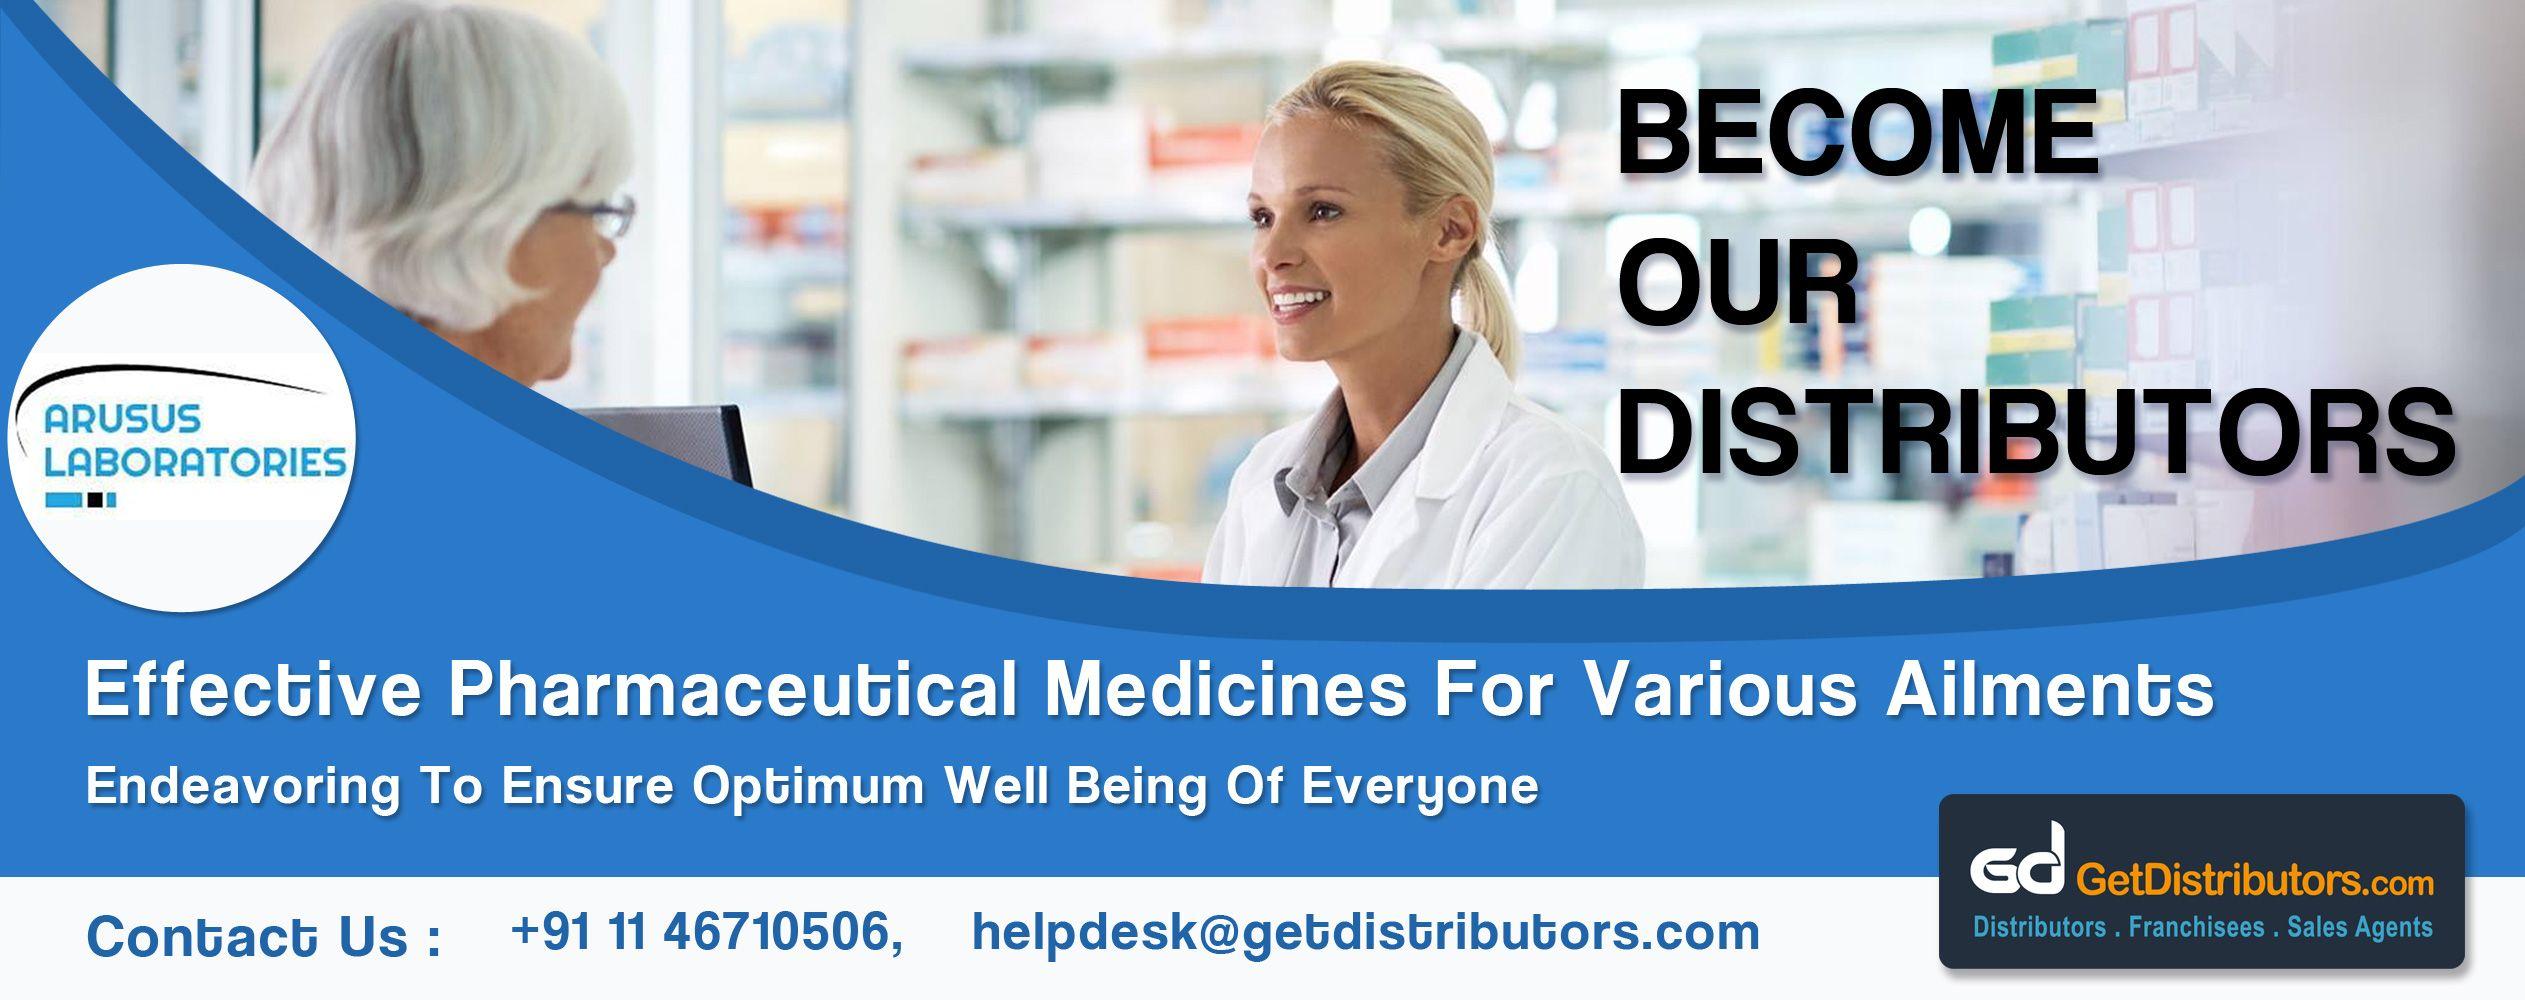 Arusus laboratories requires distributors for